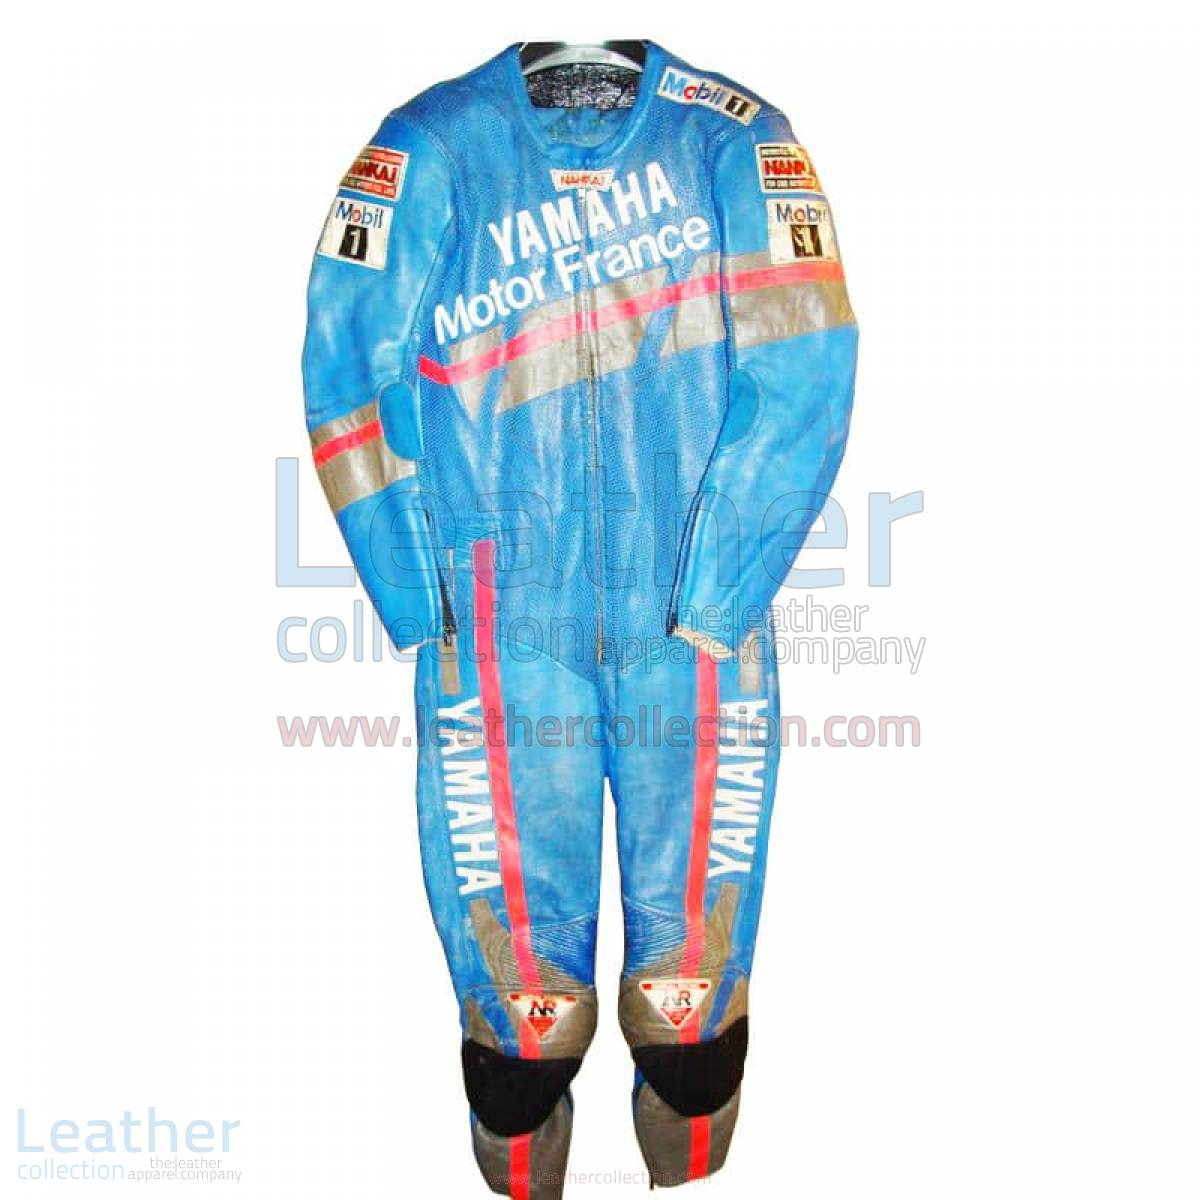 Niall Mackenzie Yamaha GP 1991 Leathers